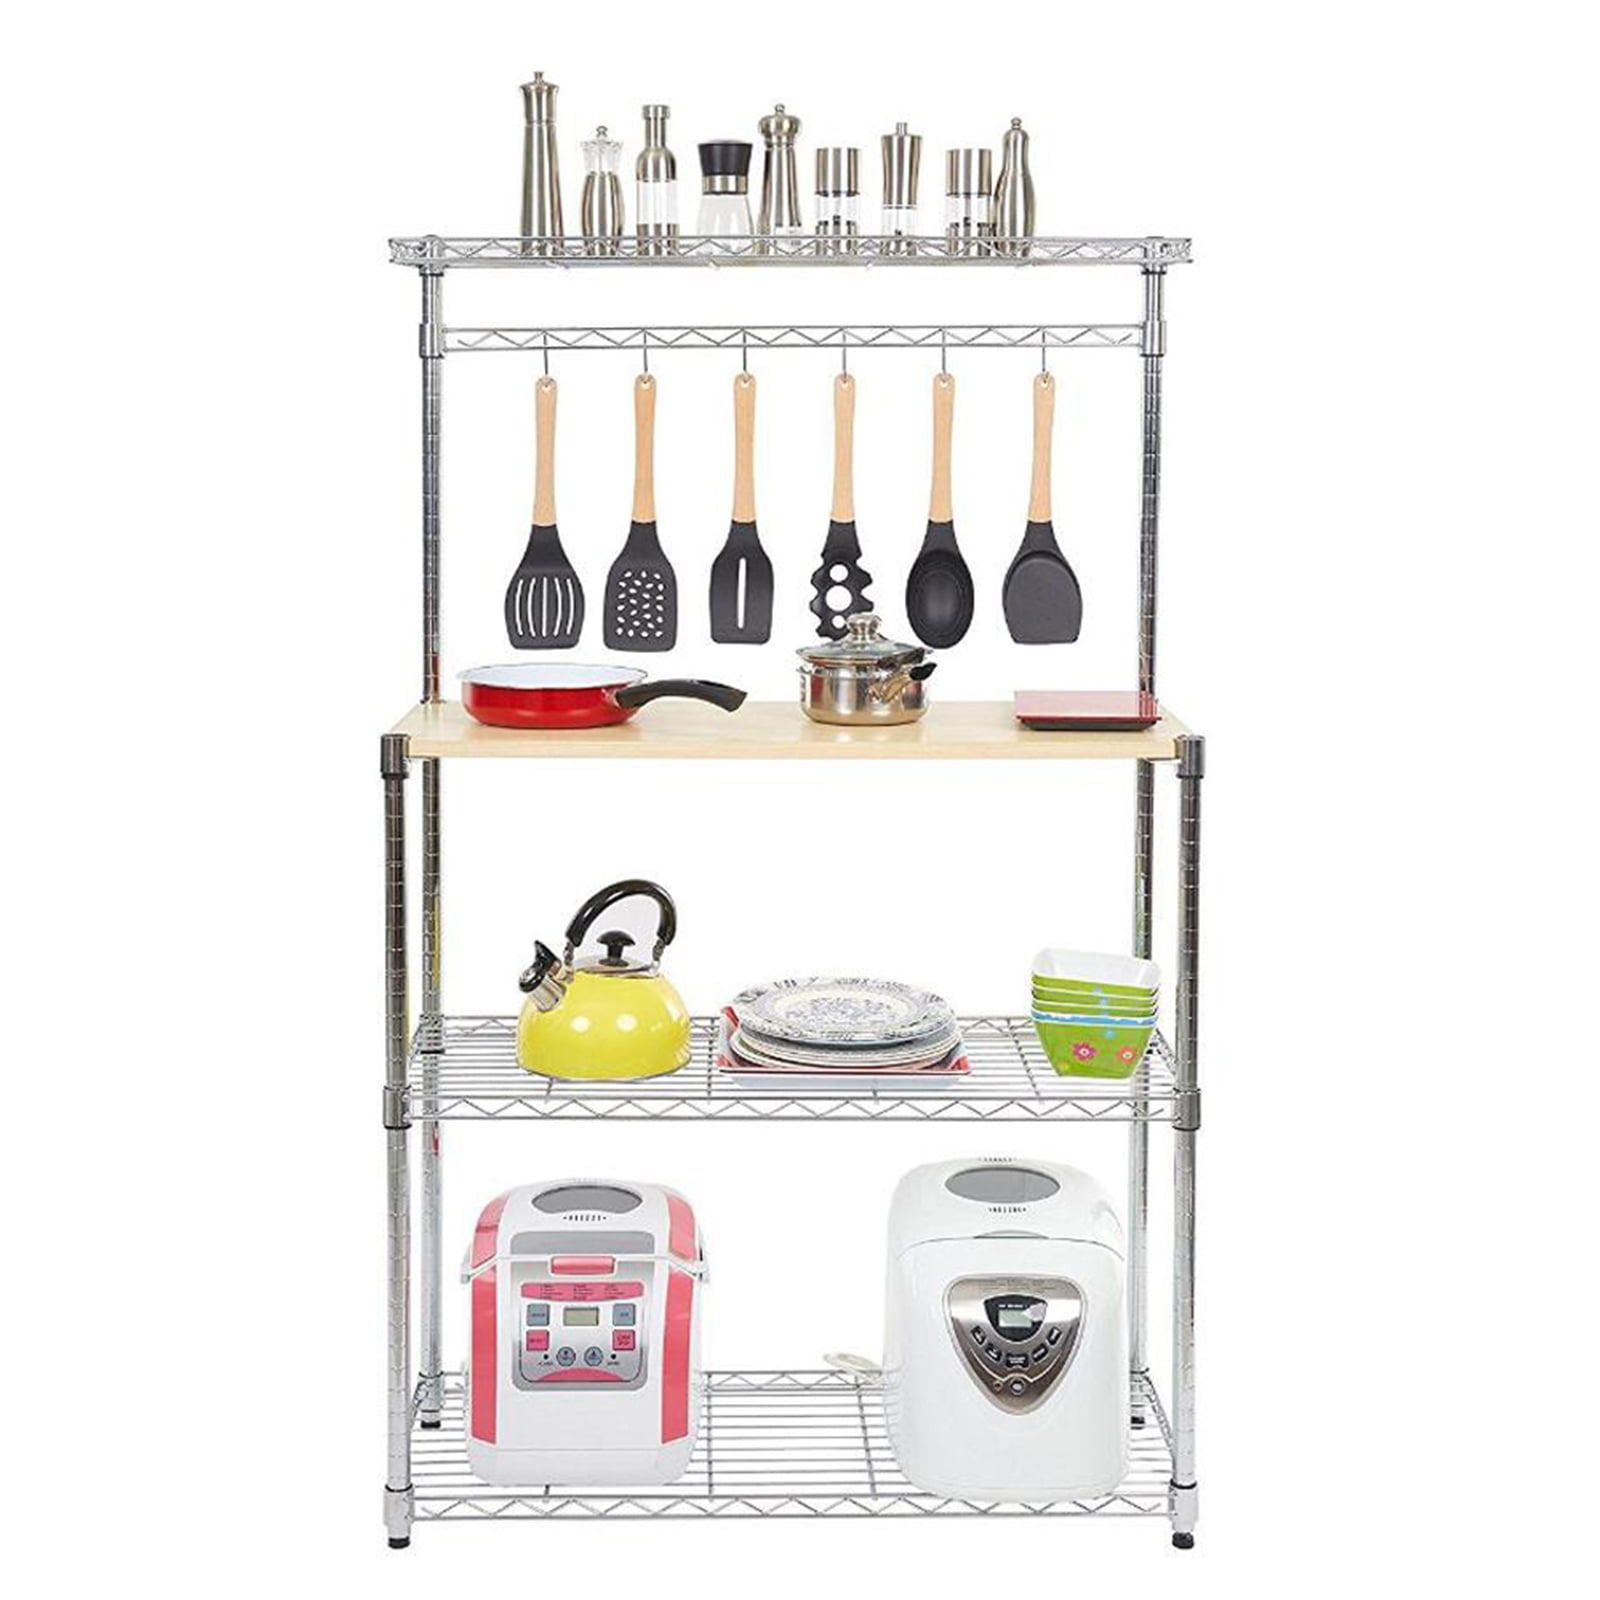 with 4 Hooks Guangshuohui Bakers Rack Microwave Rack,4Tier Kitchen Bakers Rack Microwave Oven Stand Storage Cart Workstation Shelf